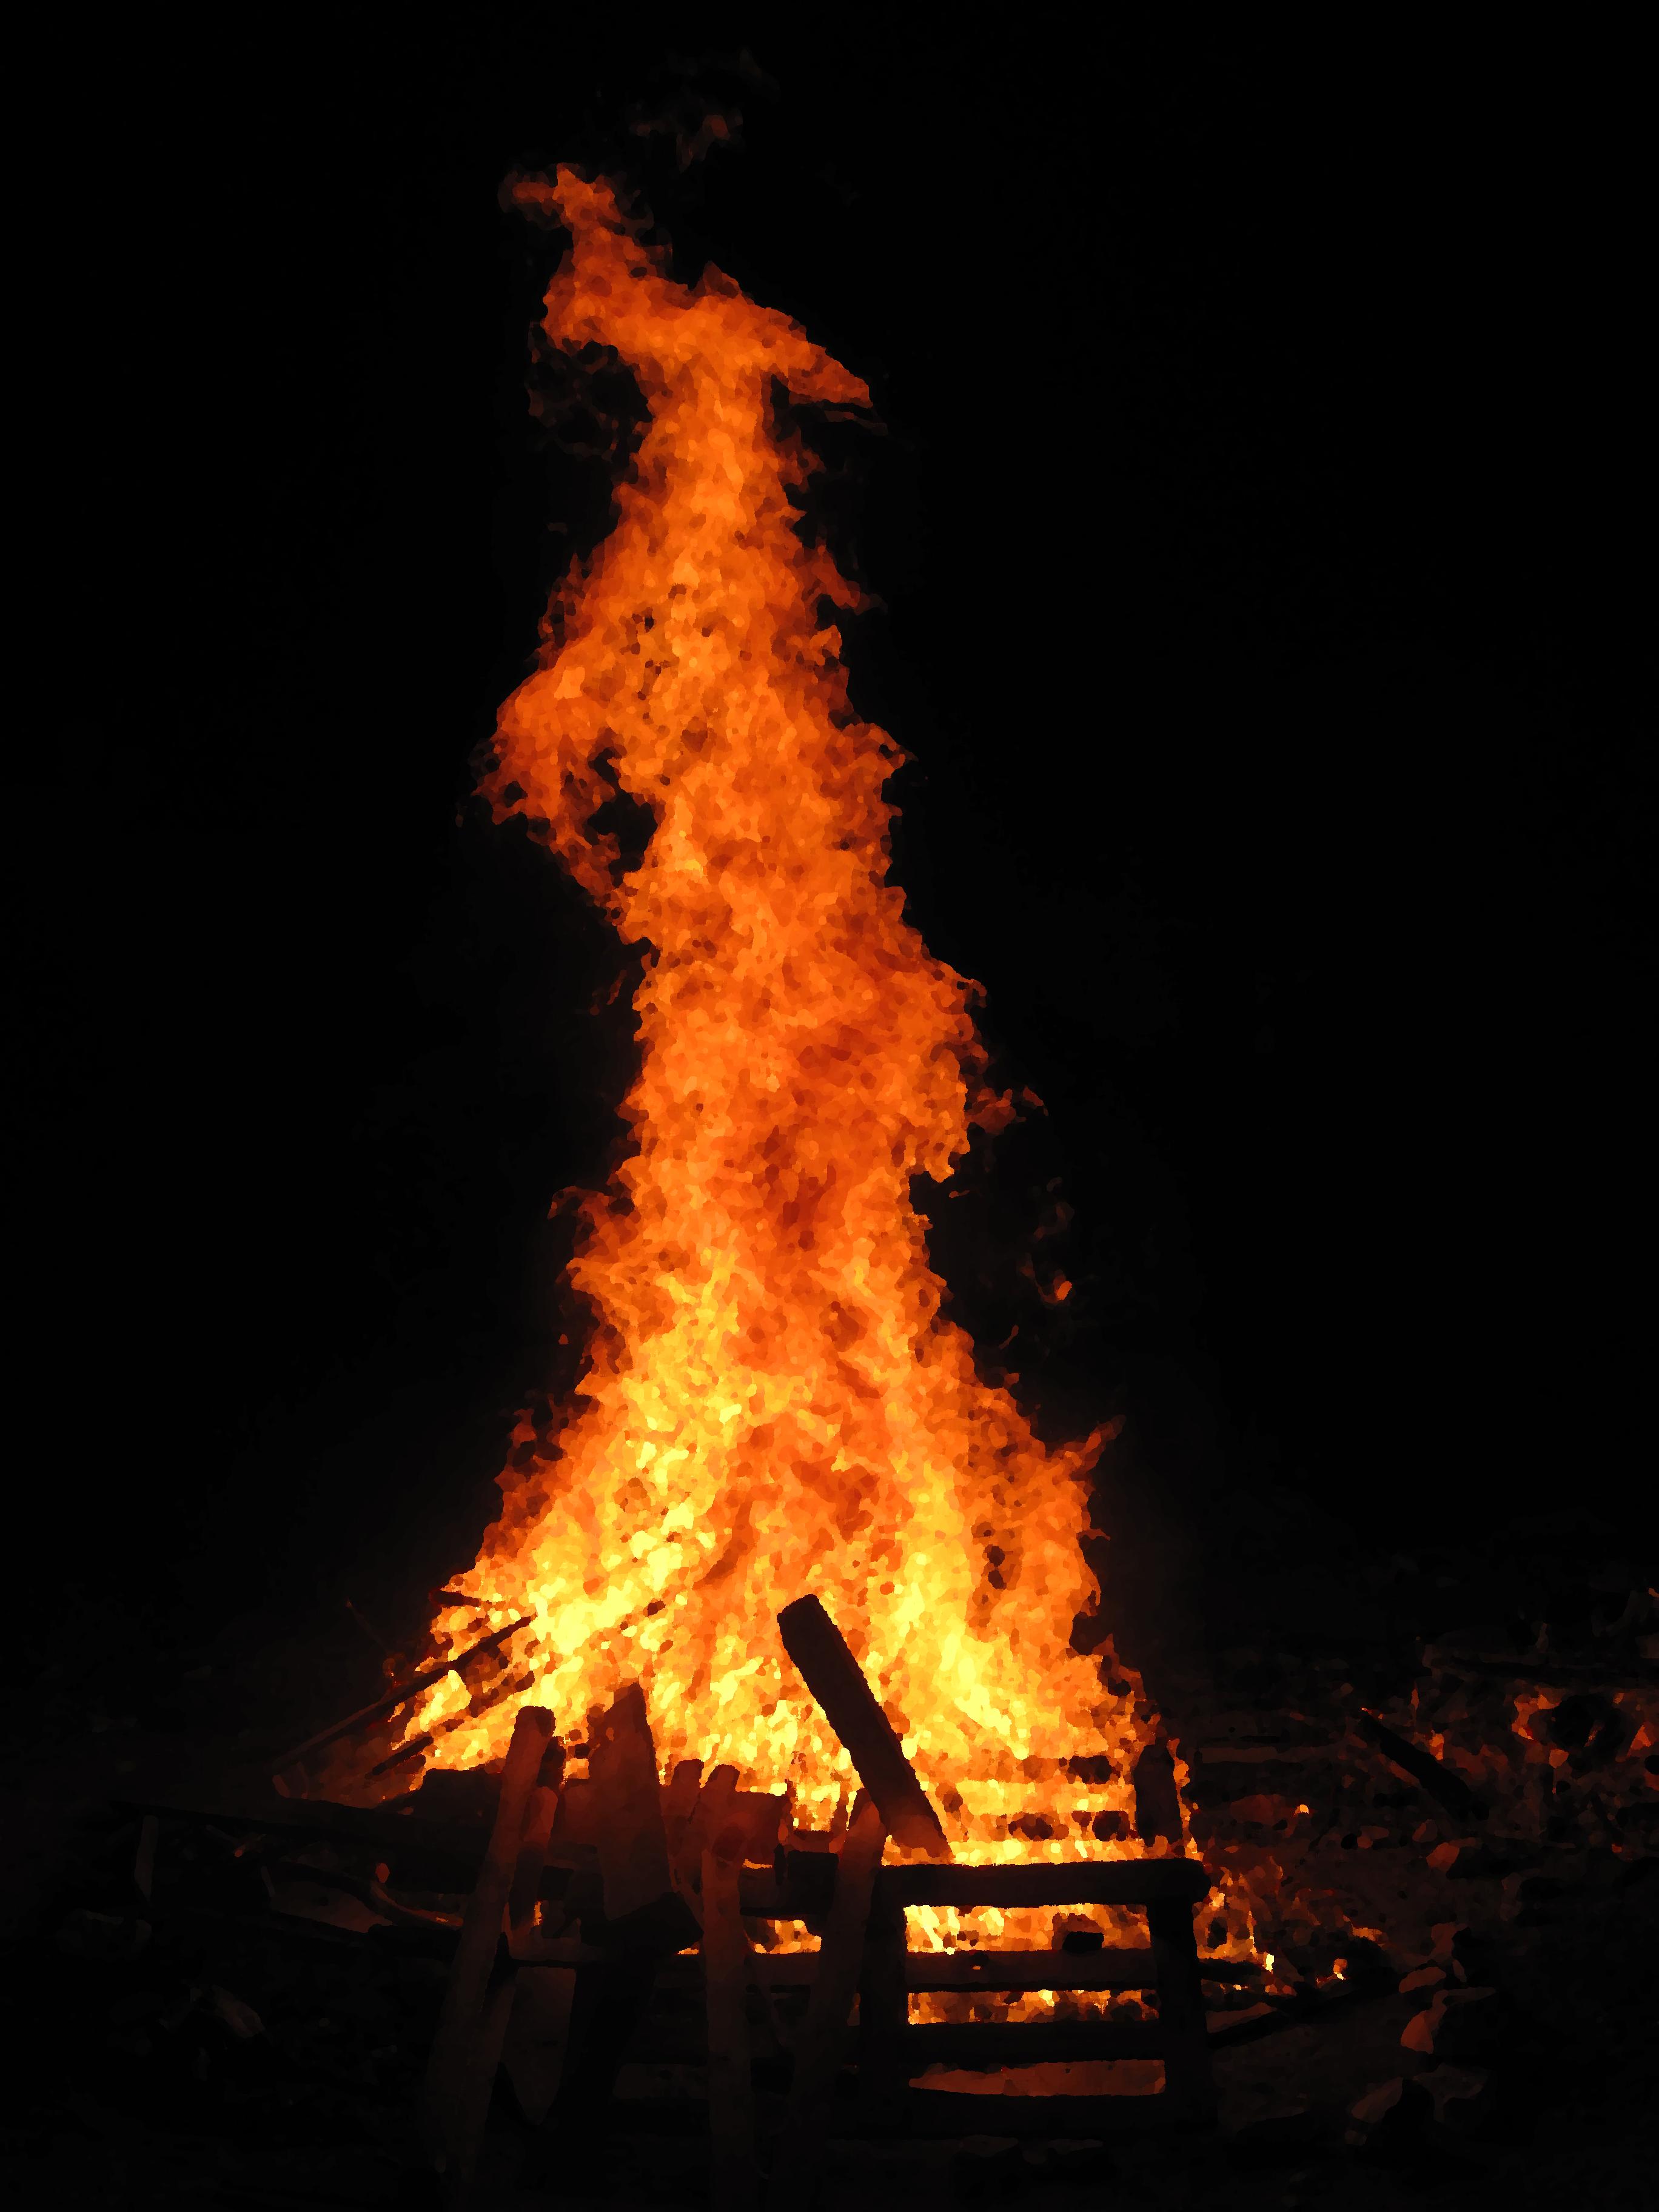 image bonfire png alternative history fandom powered by wikia rh althistory wikia com